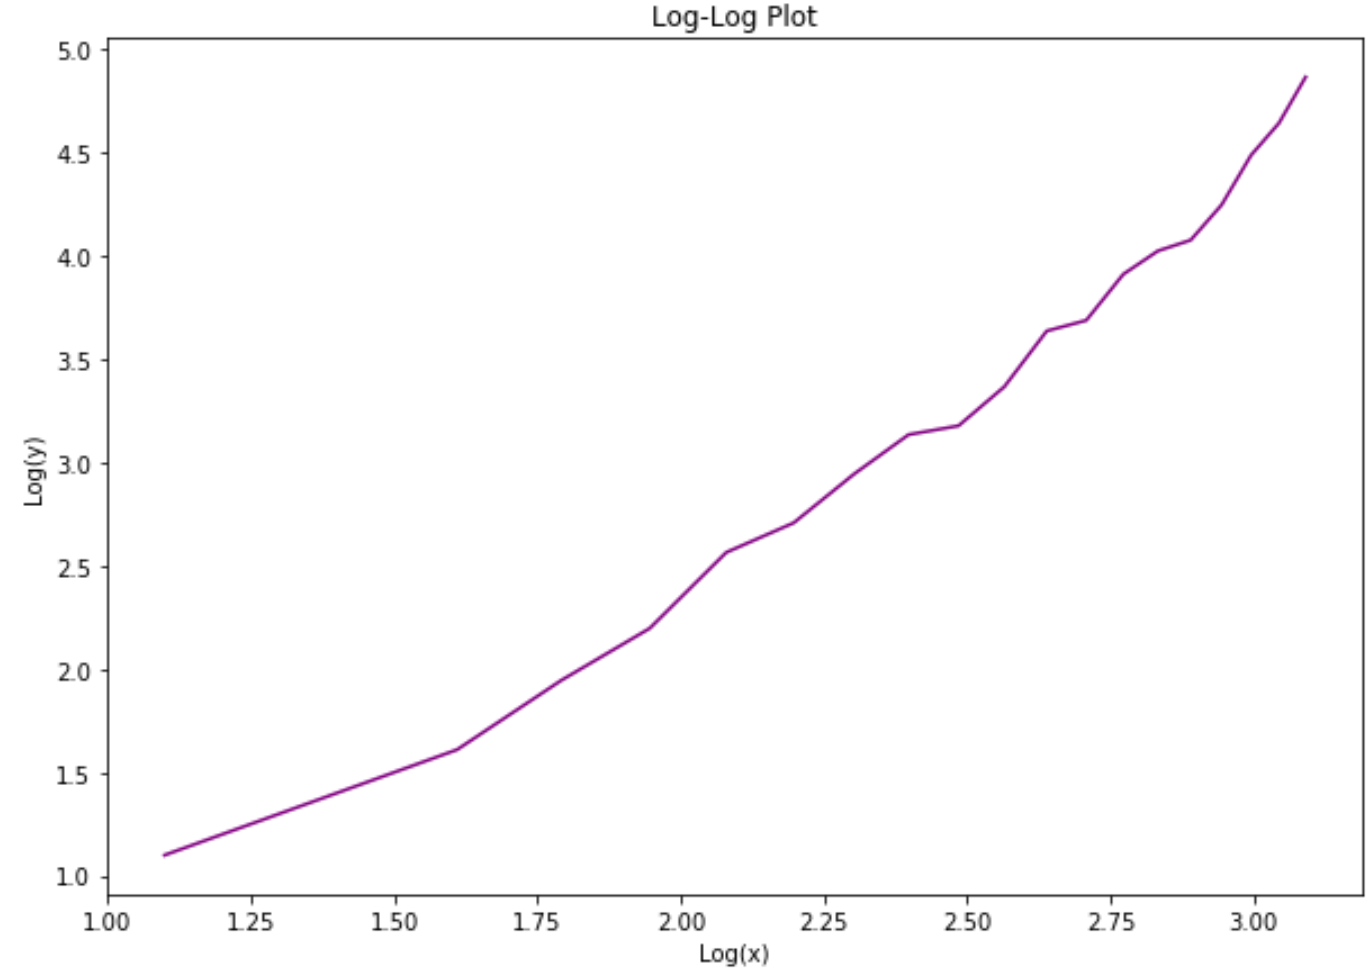 Log-log plot in Python